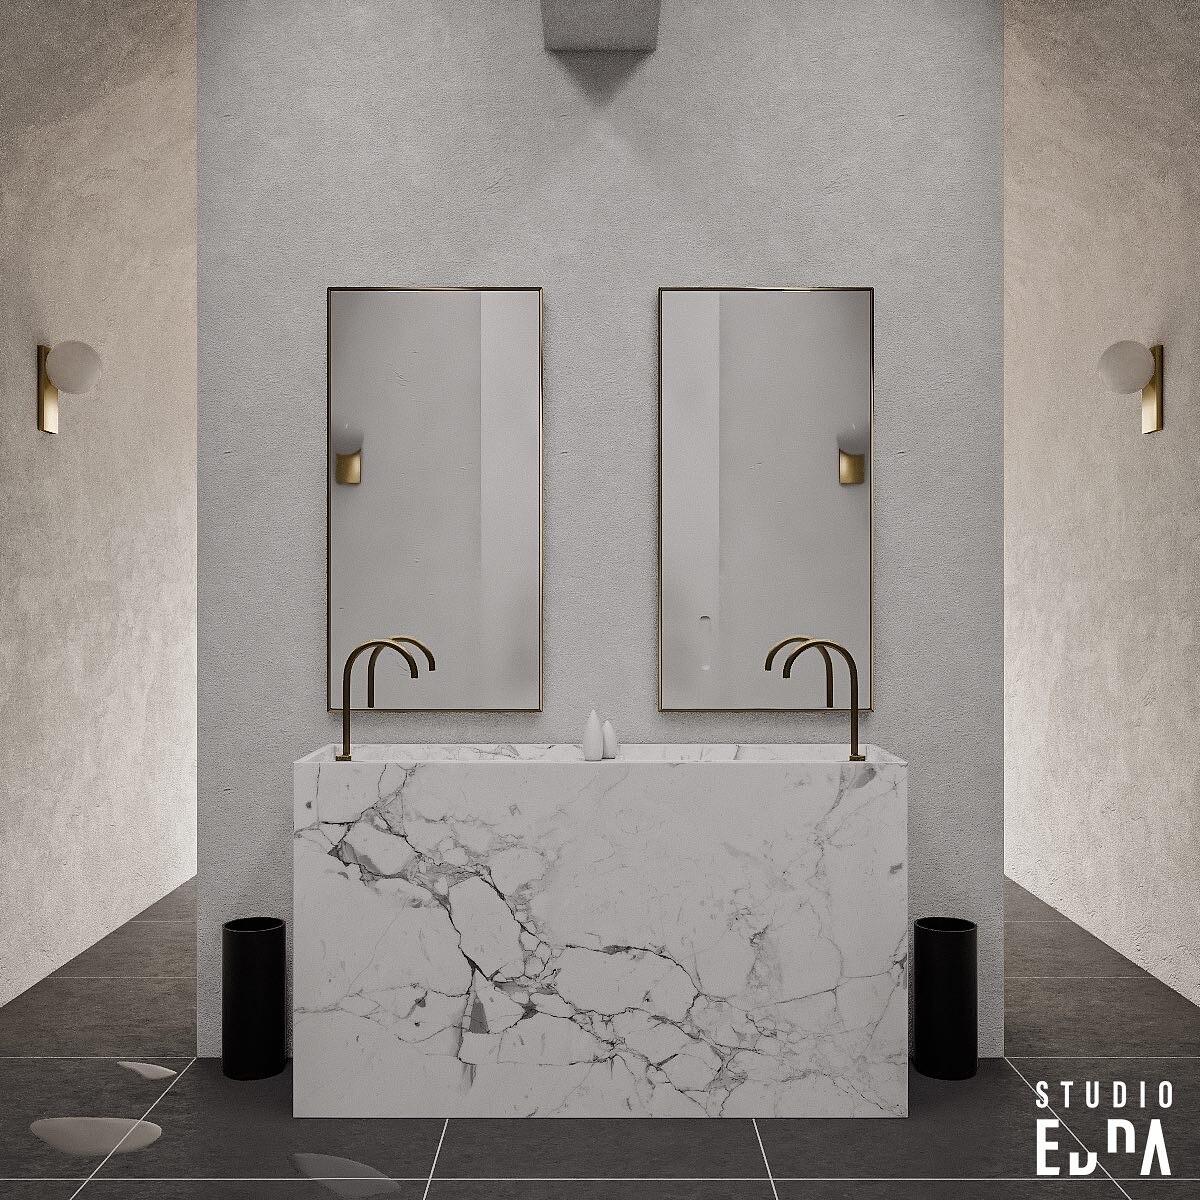 CG - Bathroom - Studio Edna